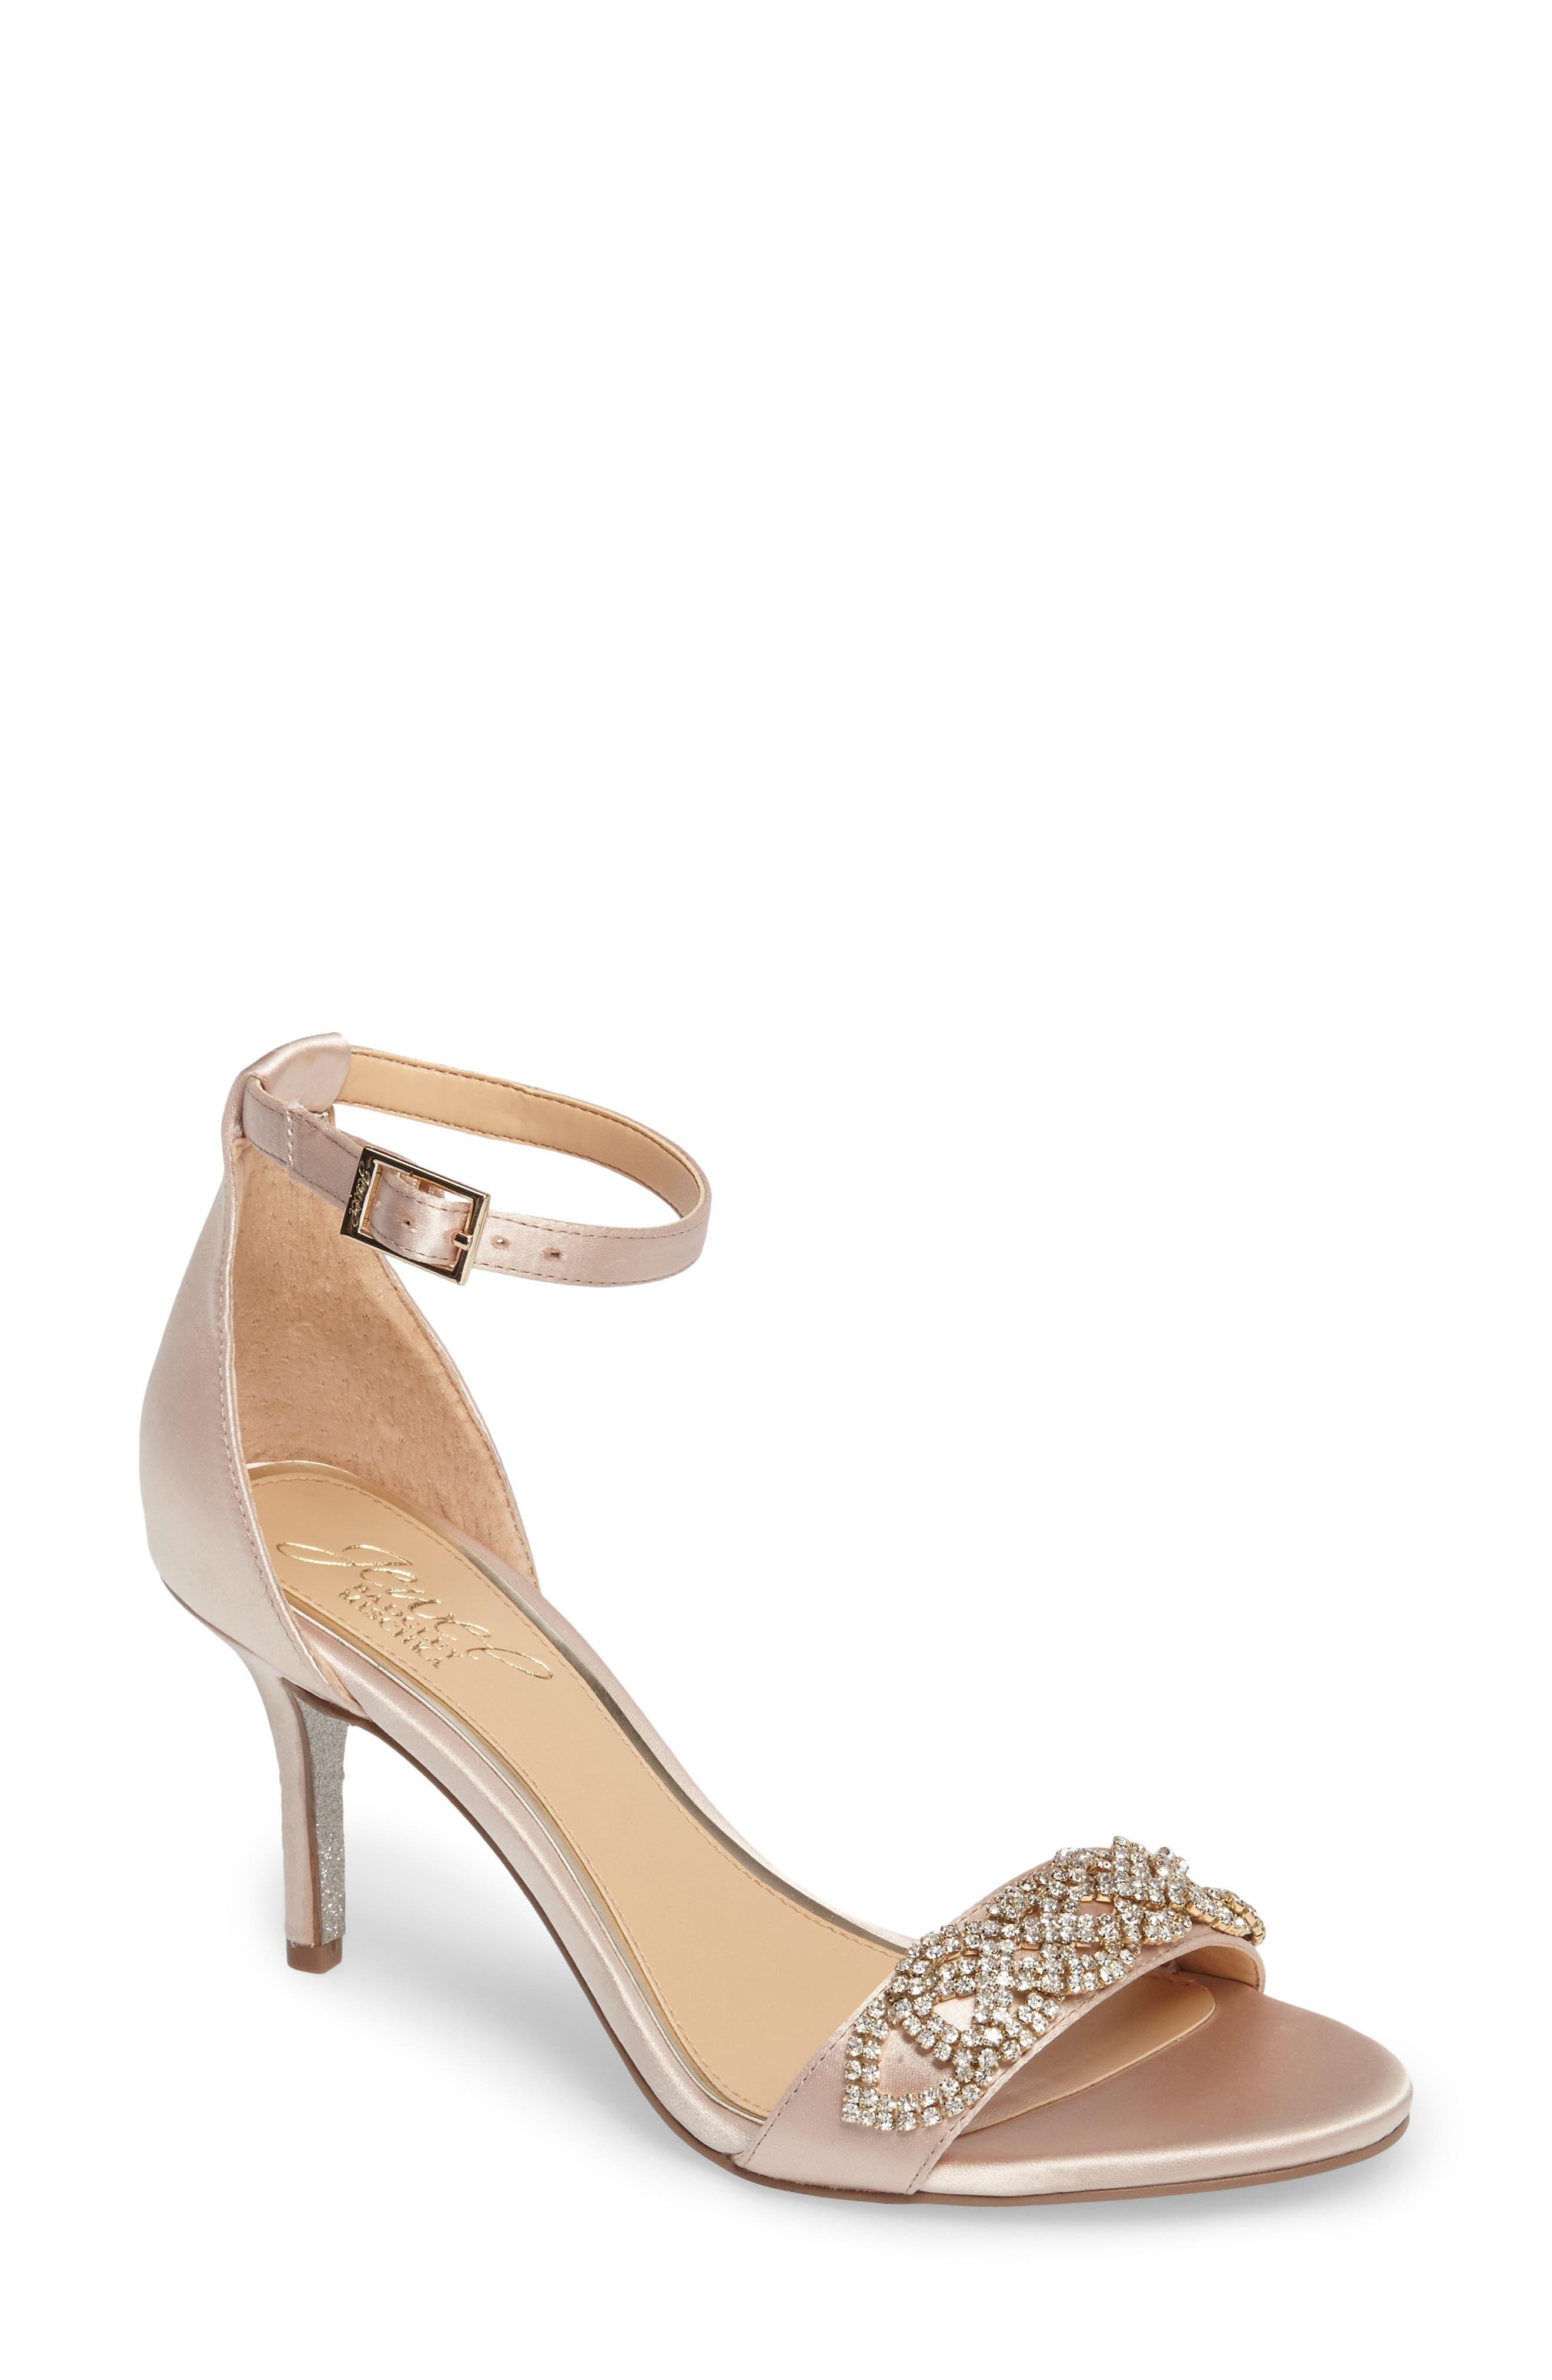 Alana Ankle Strap Sandal,                         Main,                         color, Champagne Satin